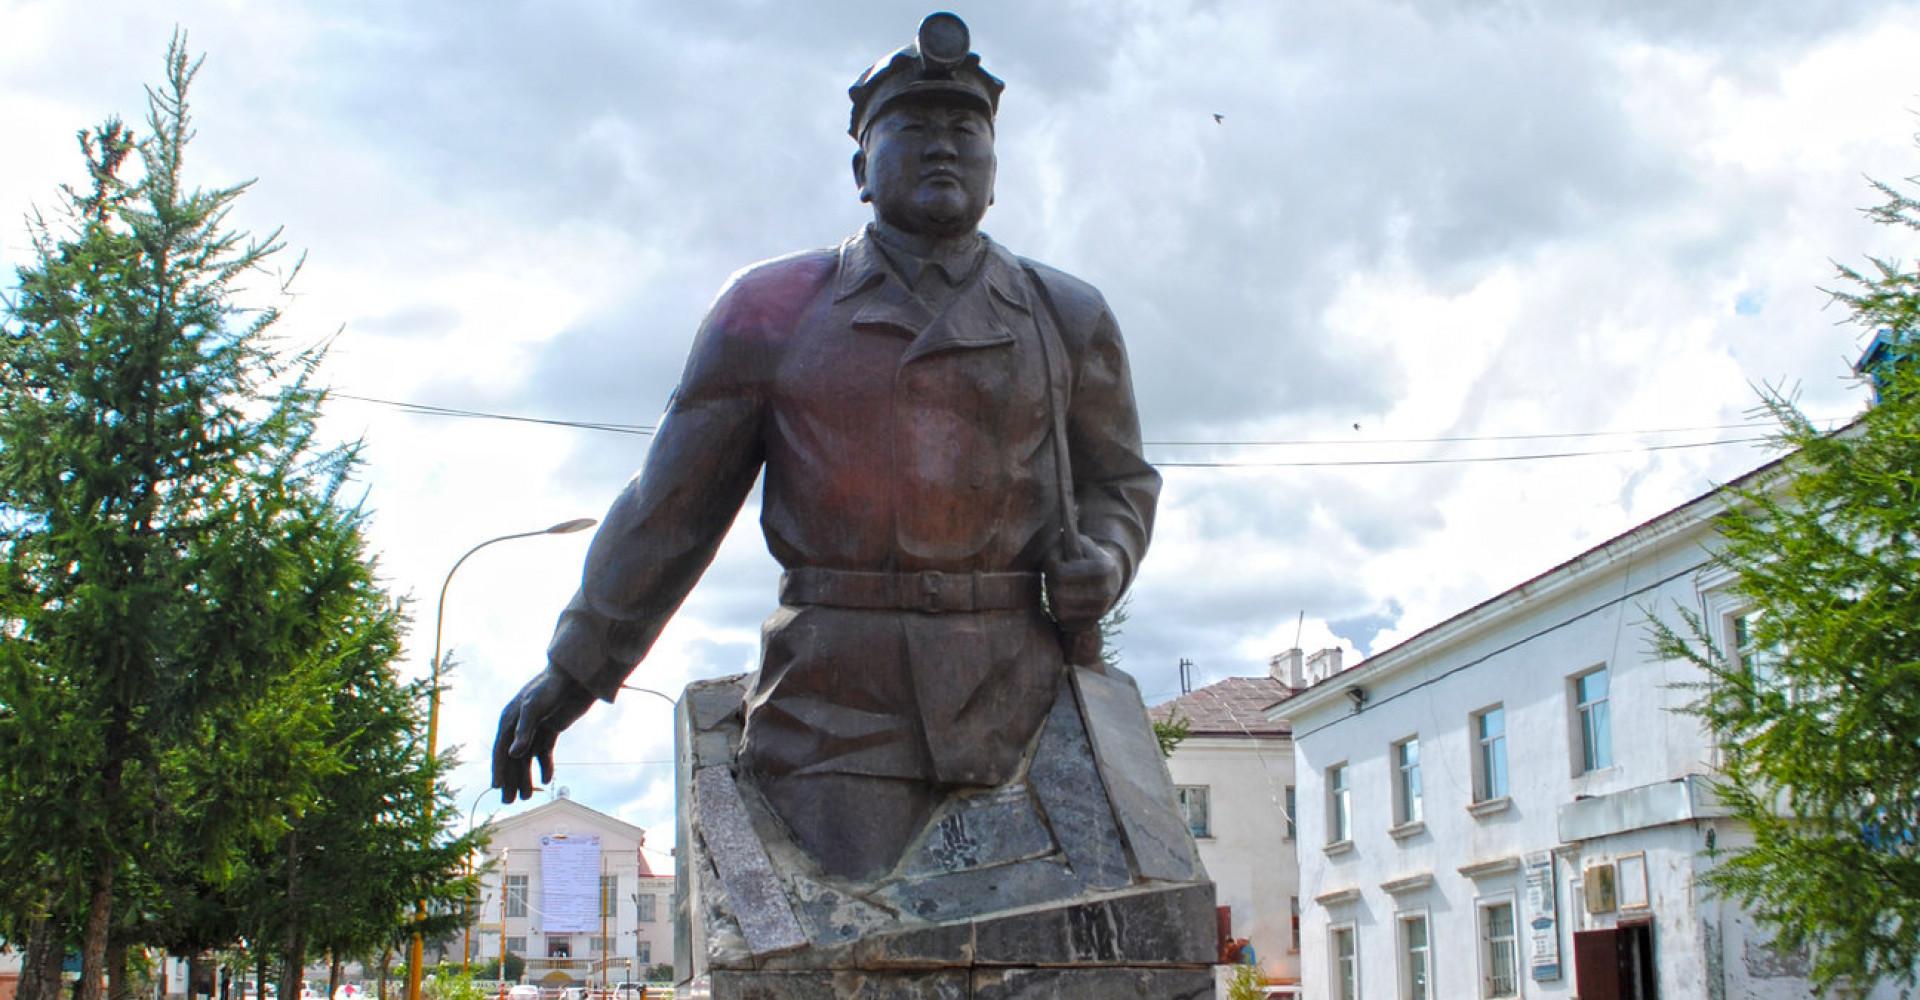 HERO OF LABOR DAMDINY DAVAAJAV STATUE